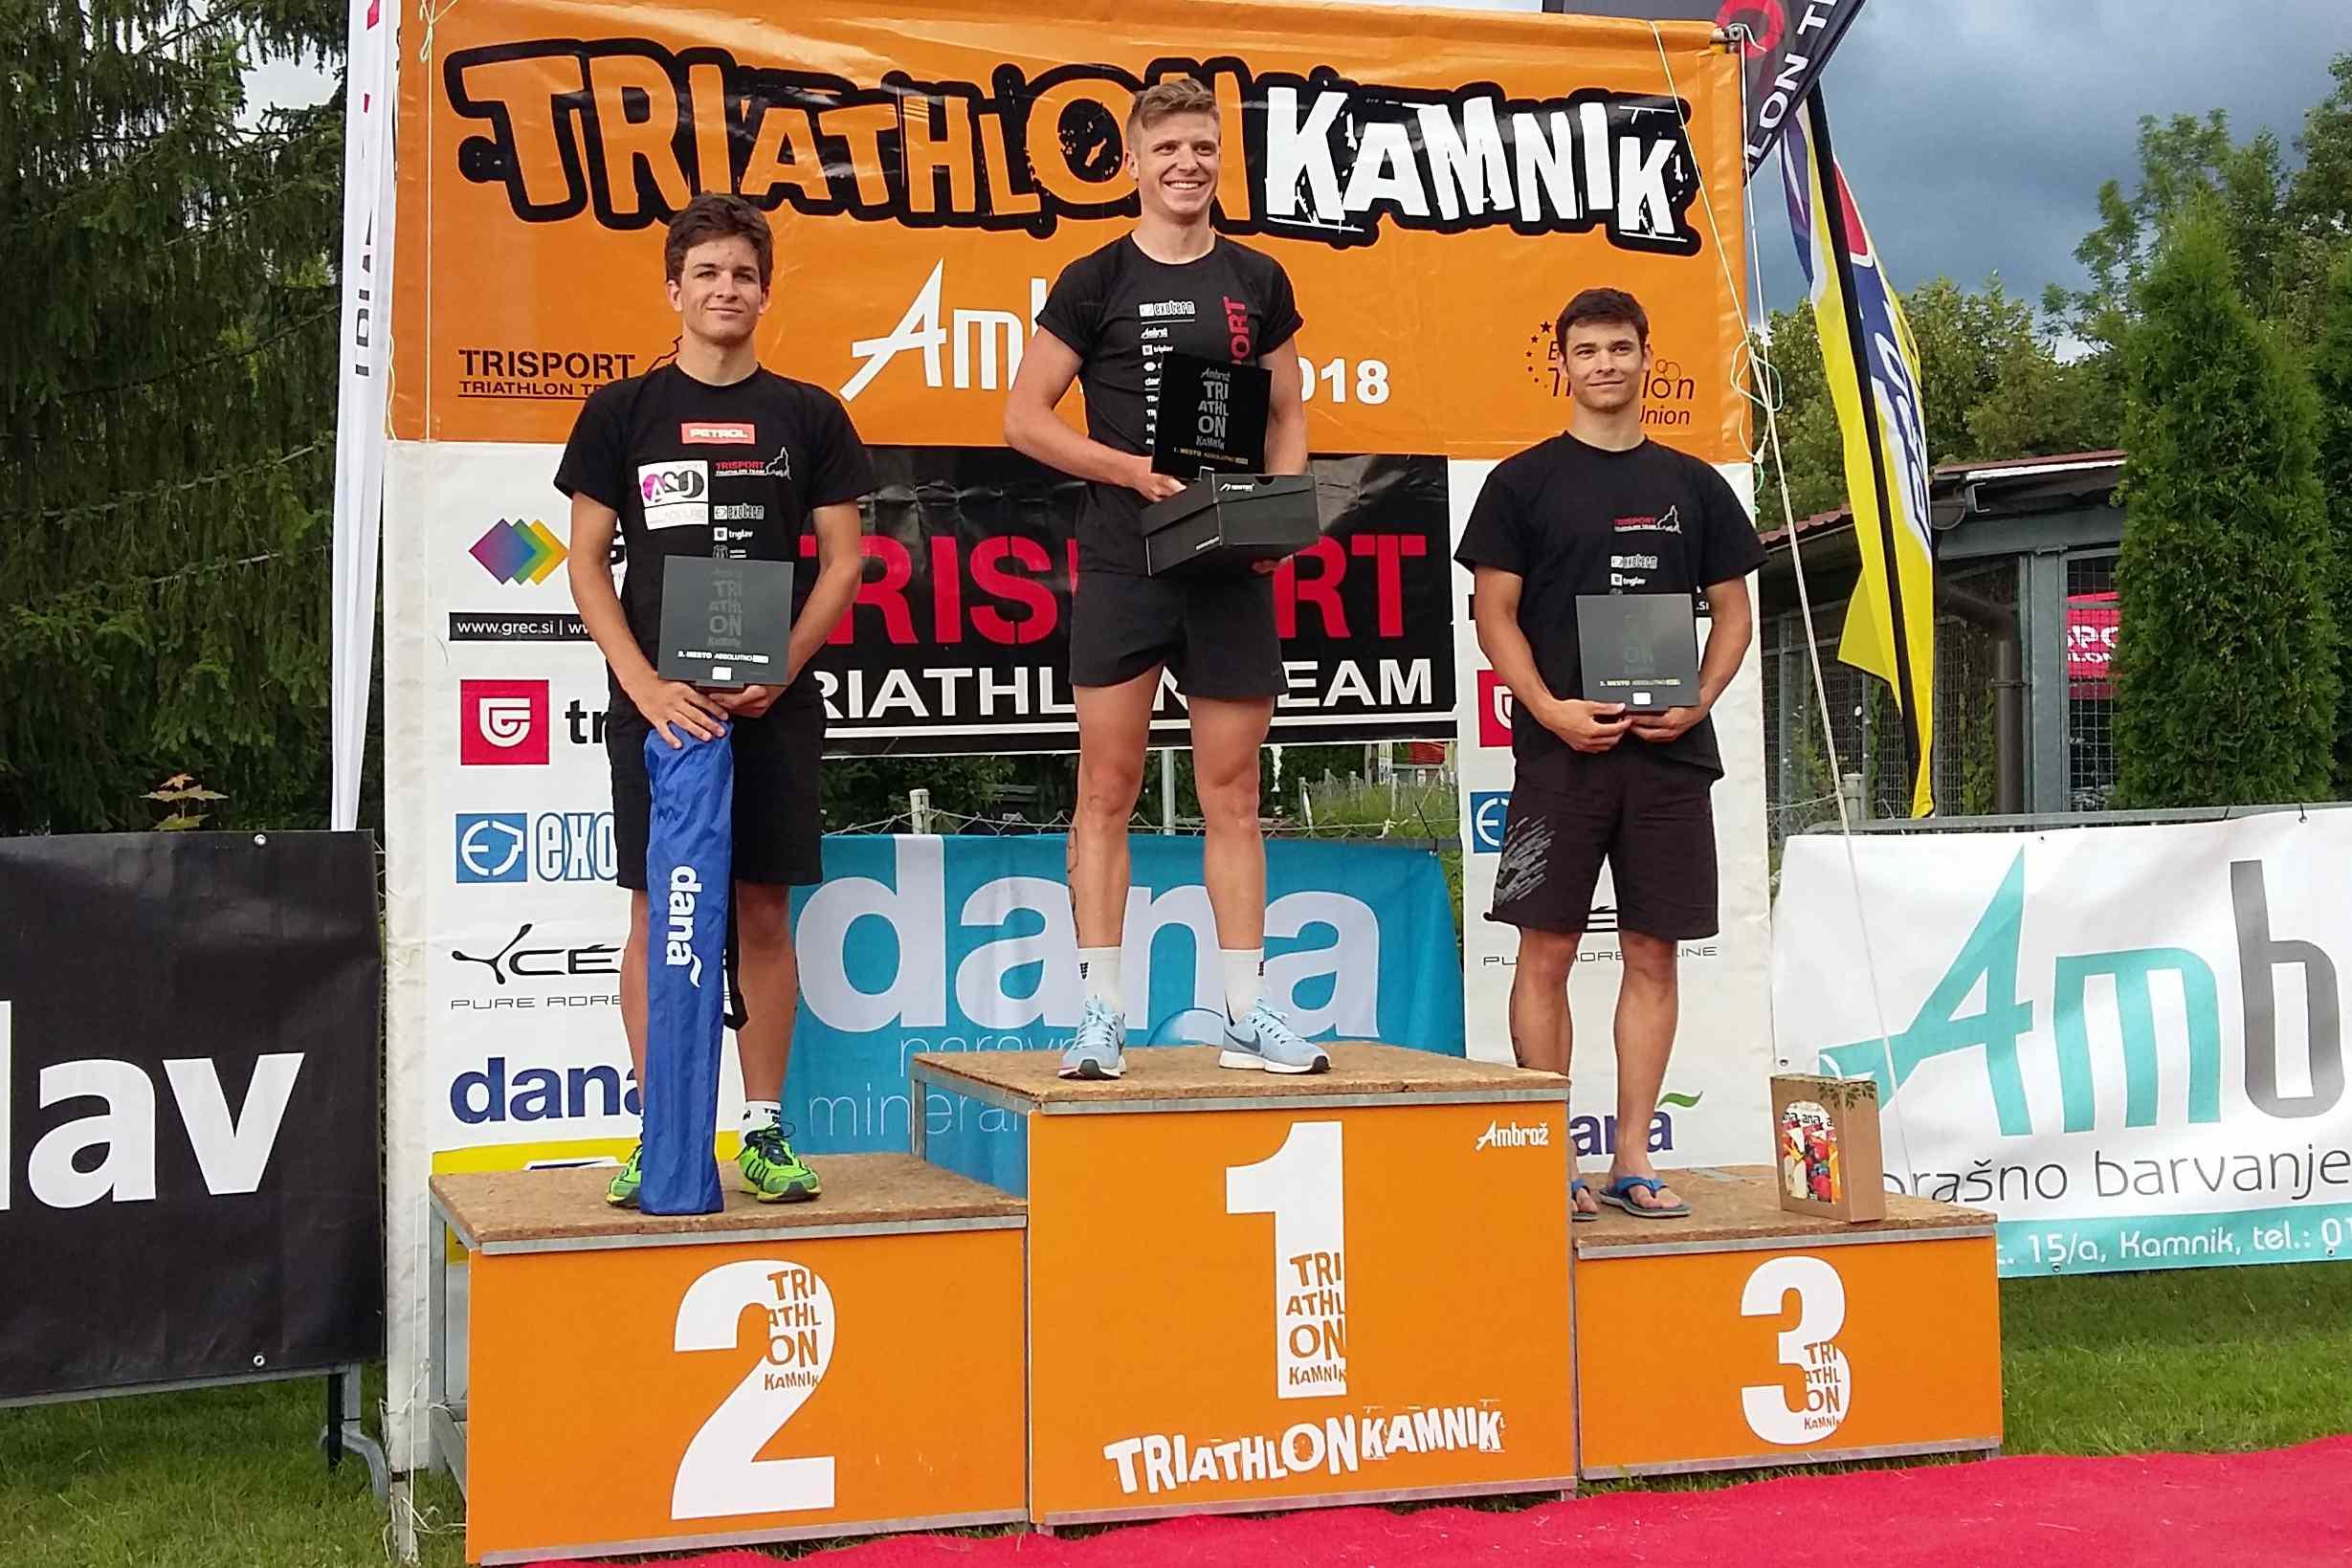 Triatlon Kamnik Ambrož 2018